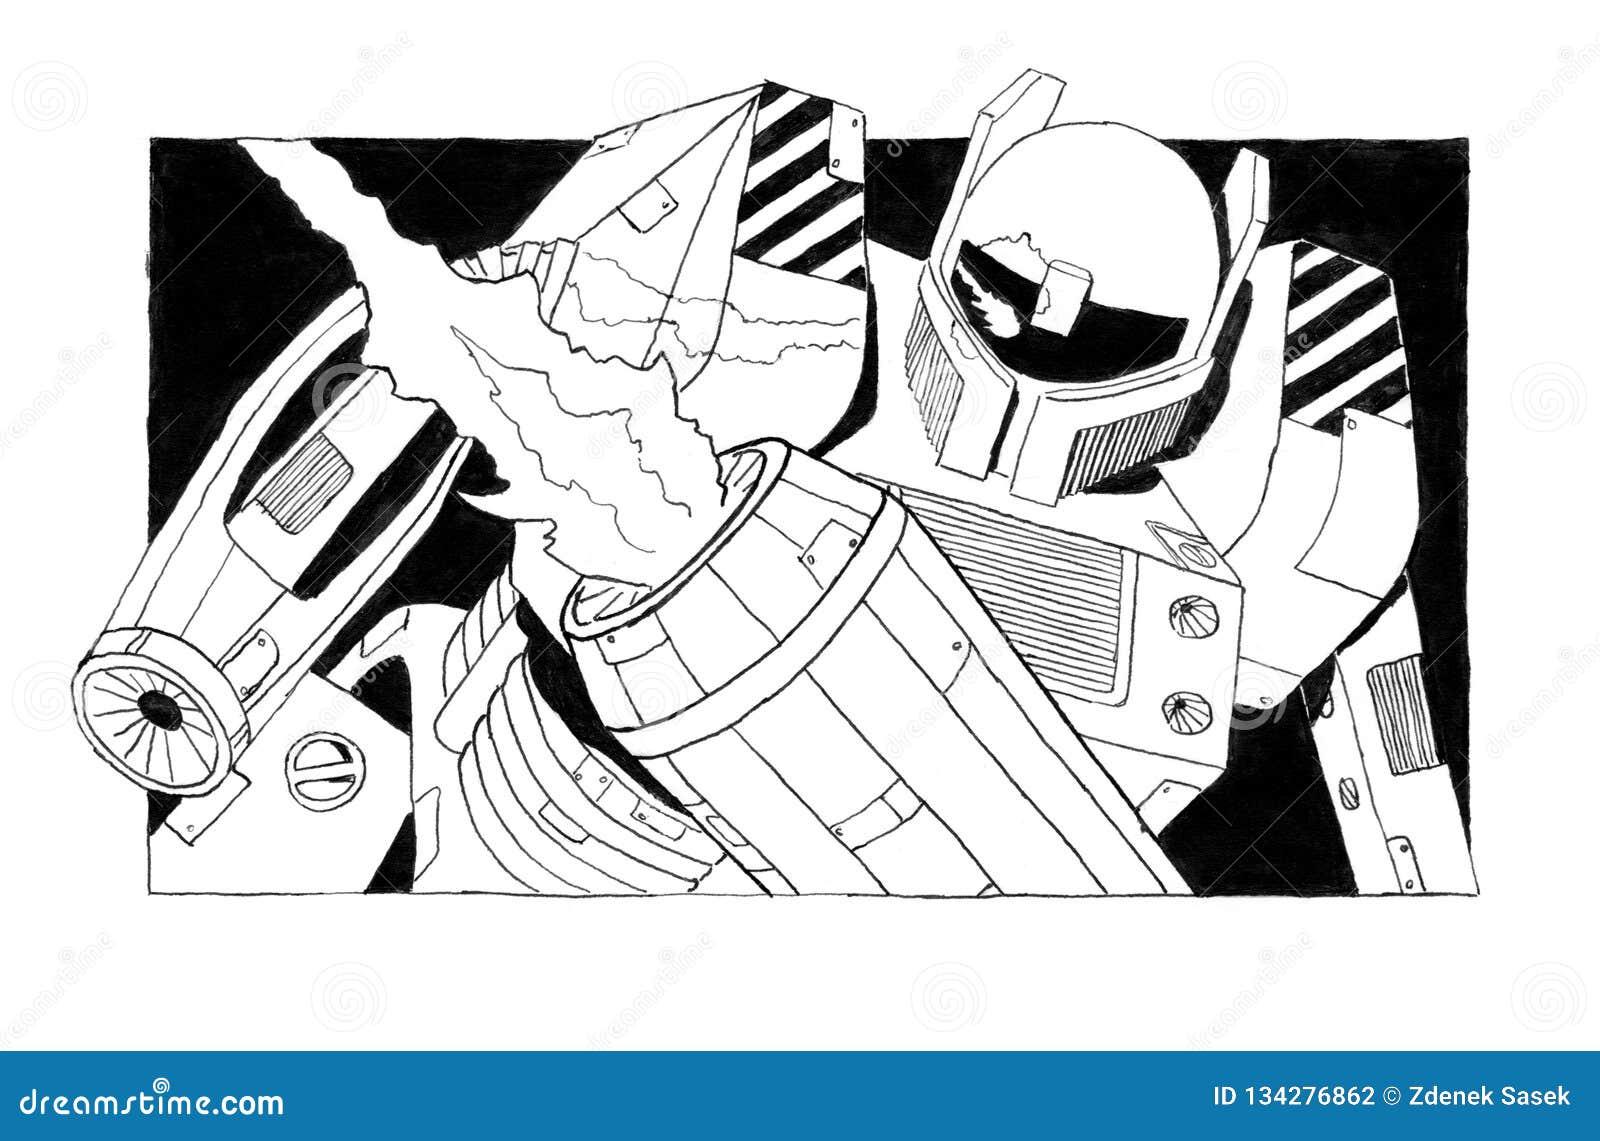 Black Grunge Rough Ink Sketch of Dangerous Armed Robot Soldier